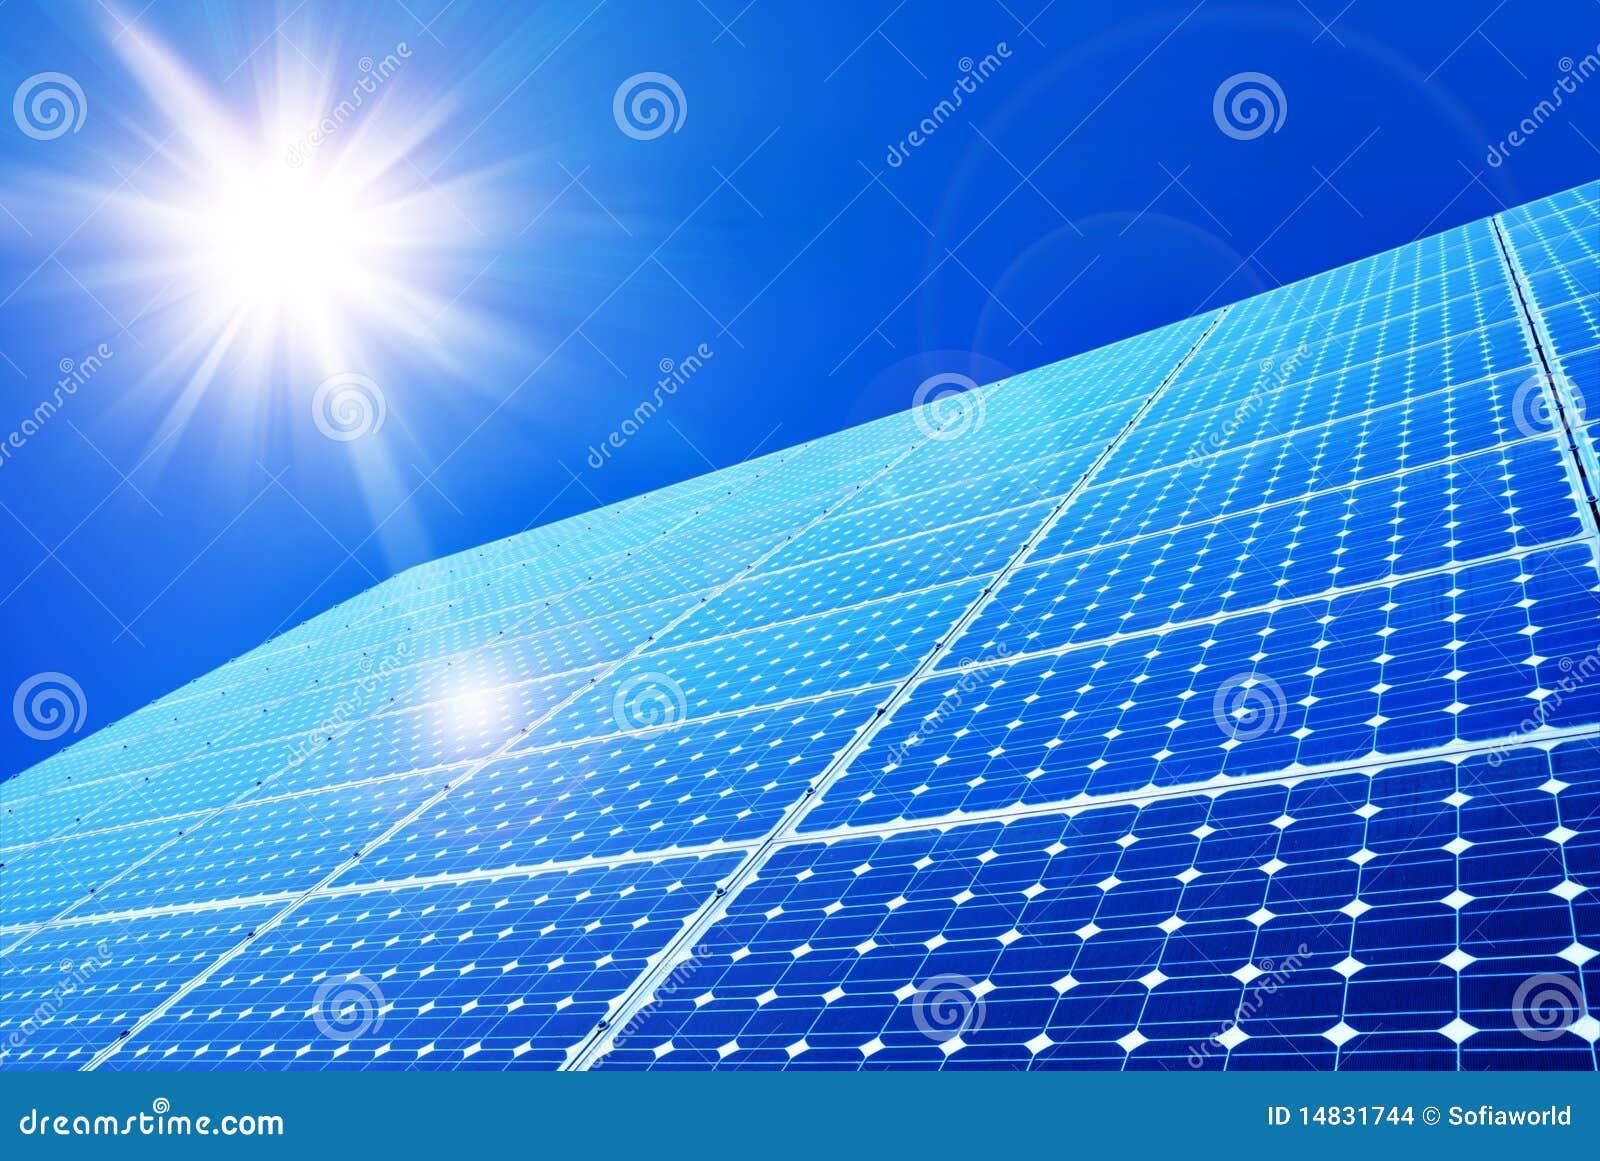 panneau solaire images stock image 14831744. Black Bedroom Furniture Sets. Home Design Ideas